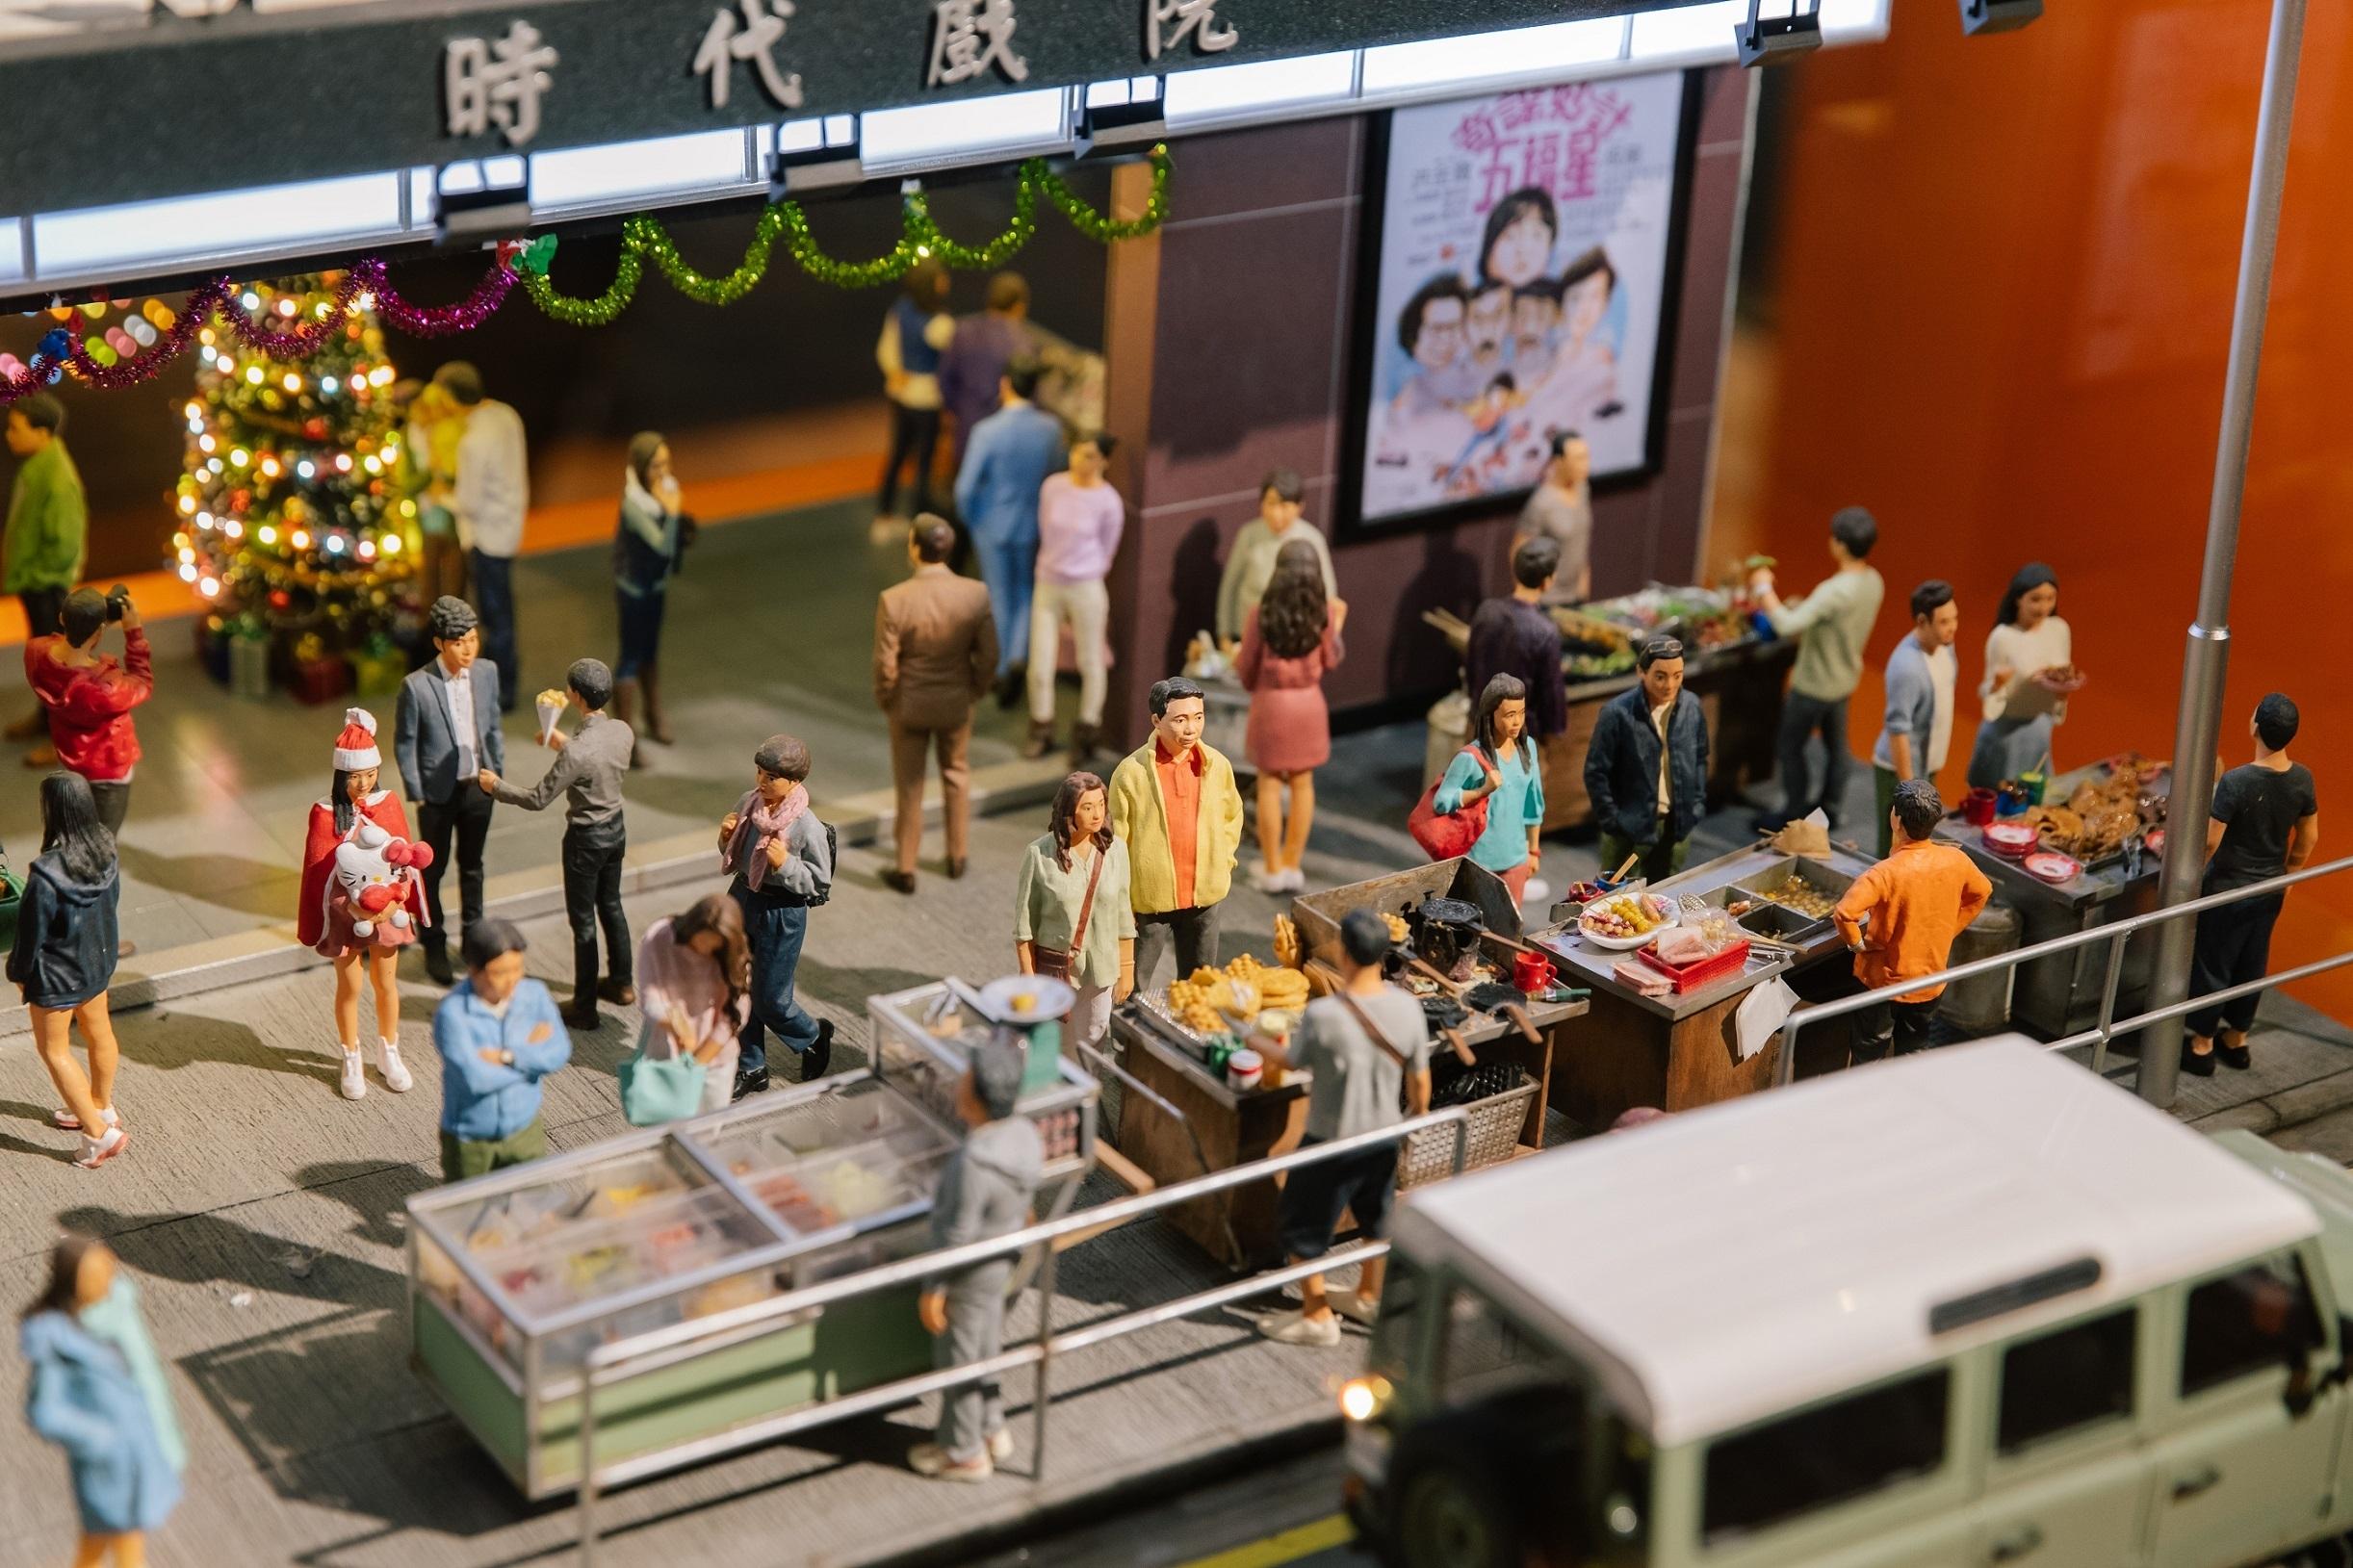 FWD Insurance: Hong Kong Story Walk – Miniature Hong Kong